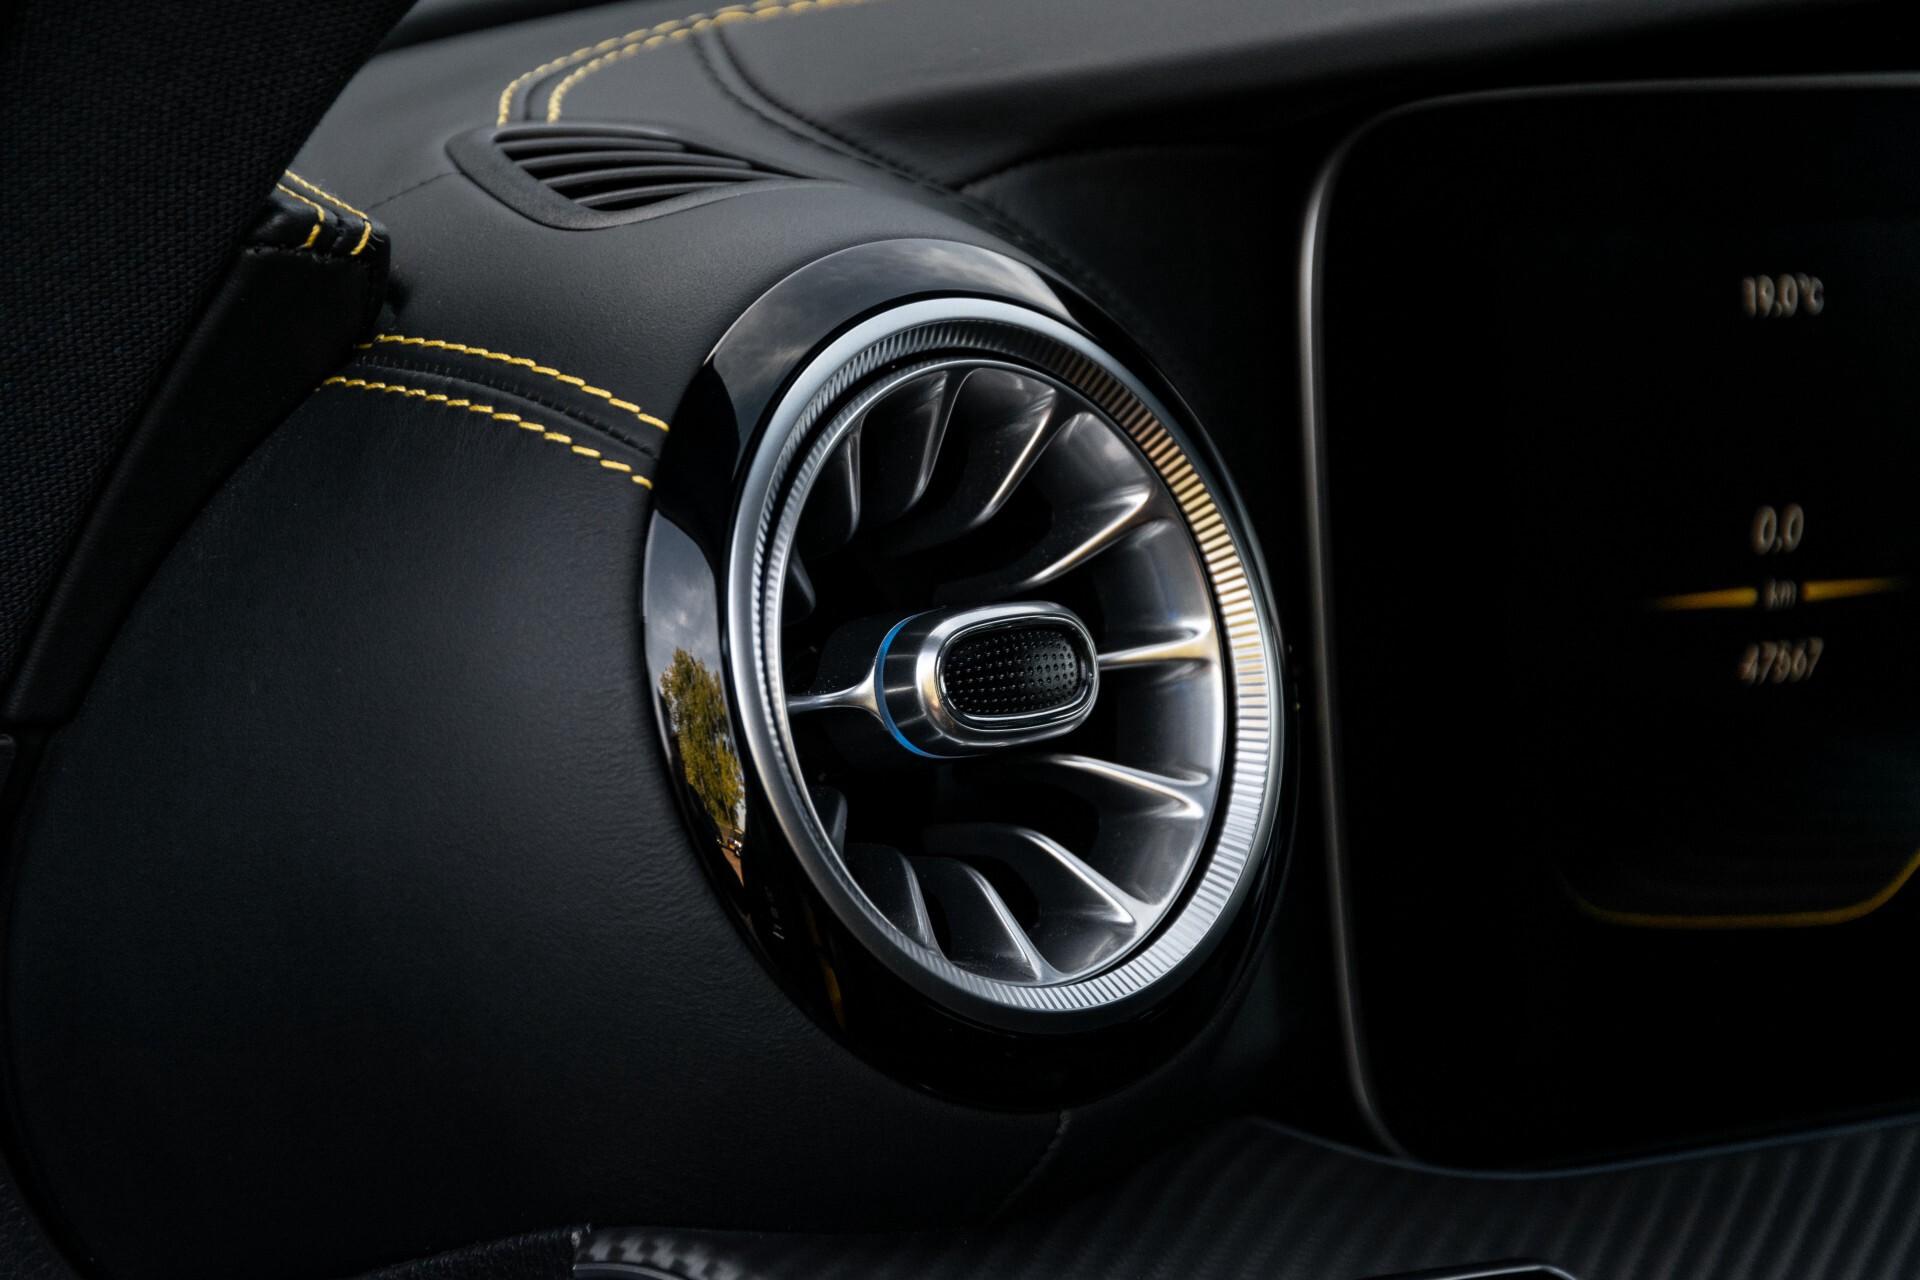 Mercedes-Benz AMG GT 4-Door Coupe 63 S 4MATIC+ Edition 1 Keramisch/Carbon/First Class/Dynamic Plus/Burmester High End 3D Aut9 Foto 34